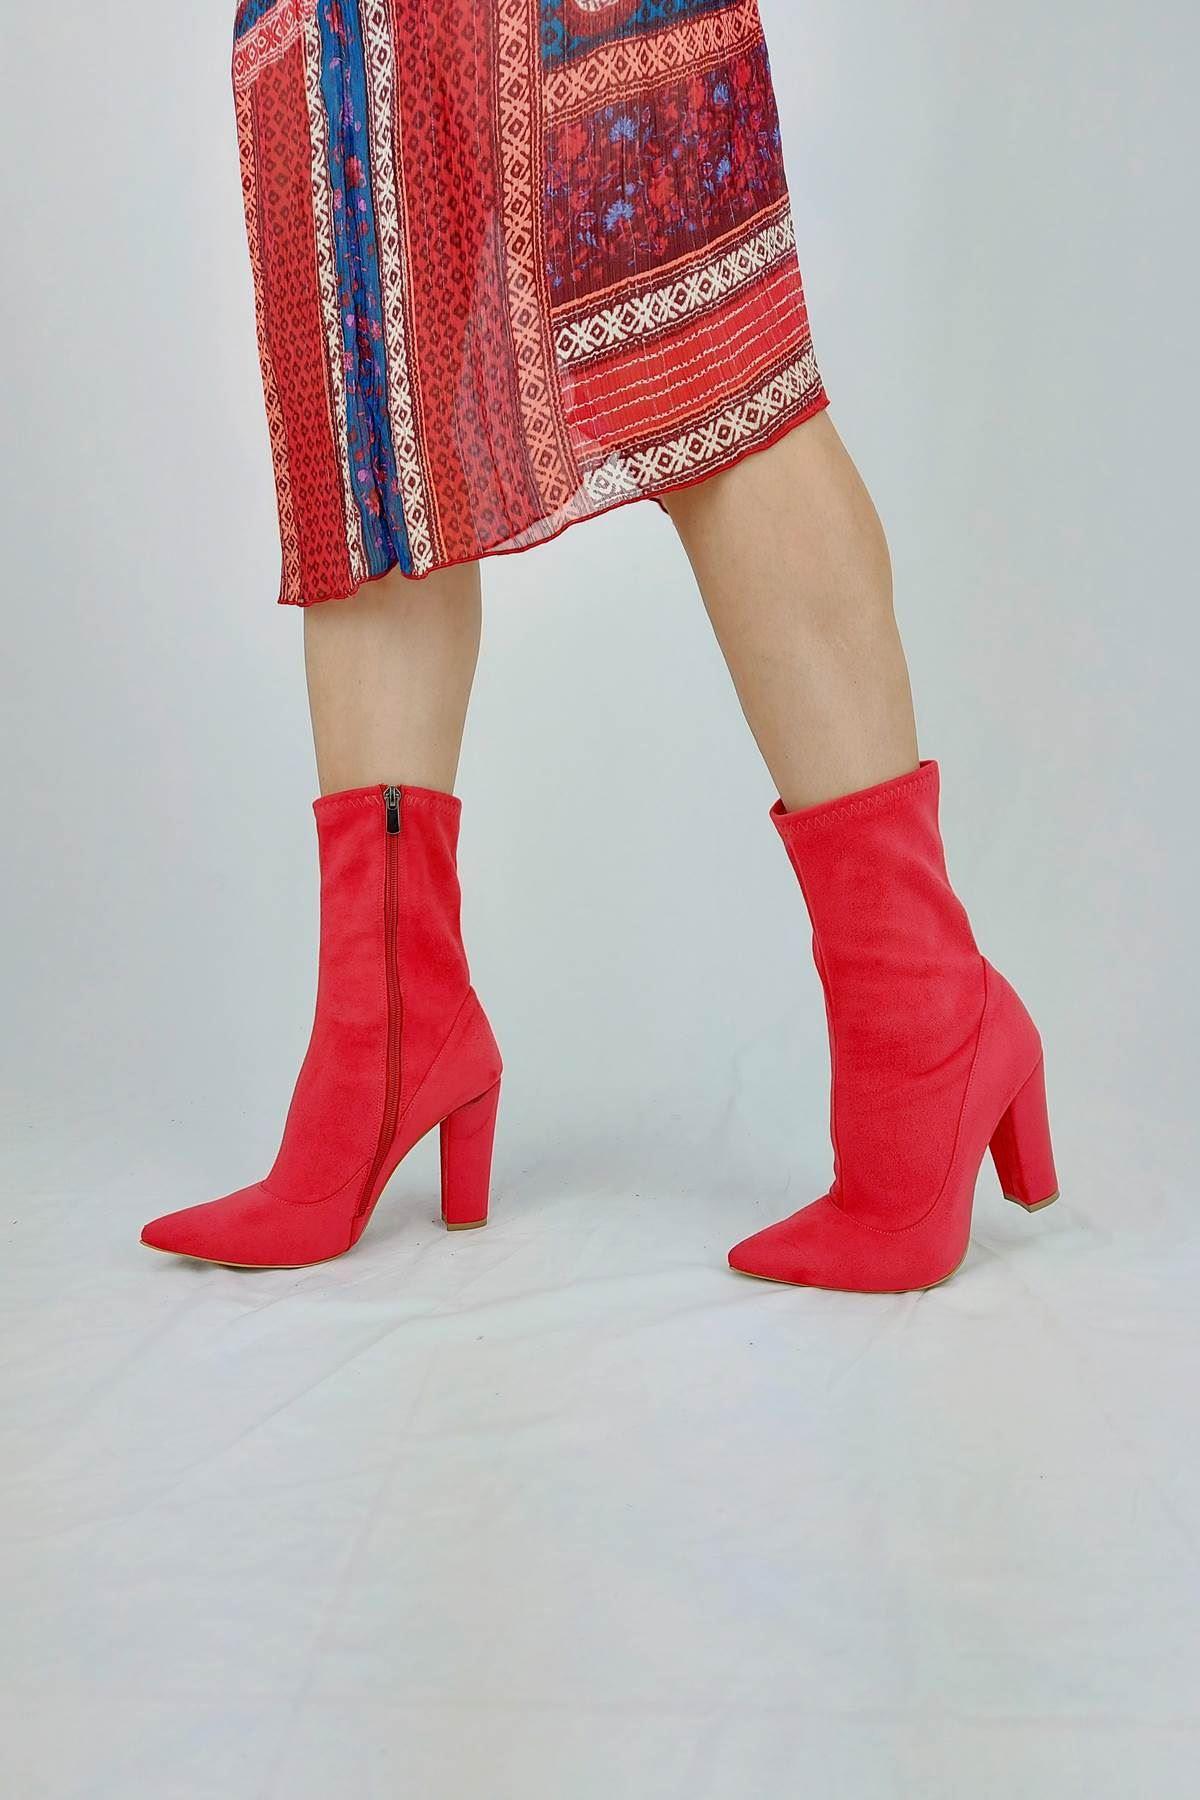 Rozan Kırmızı Süet Topuklu Bot